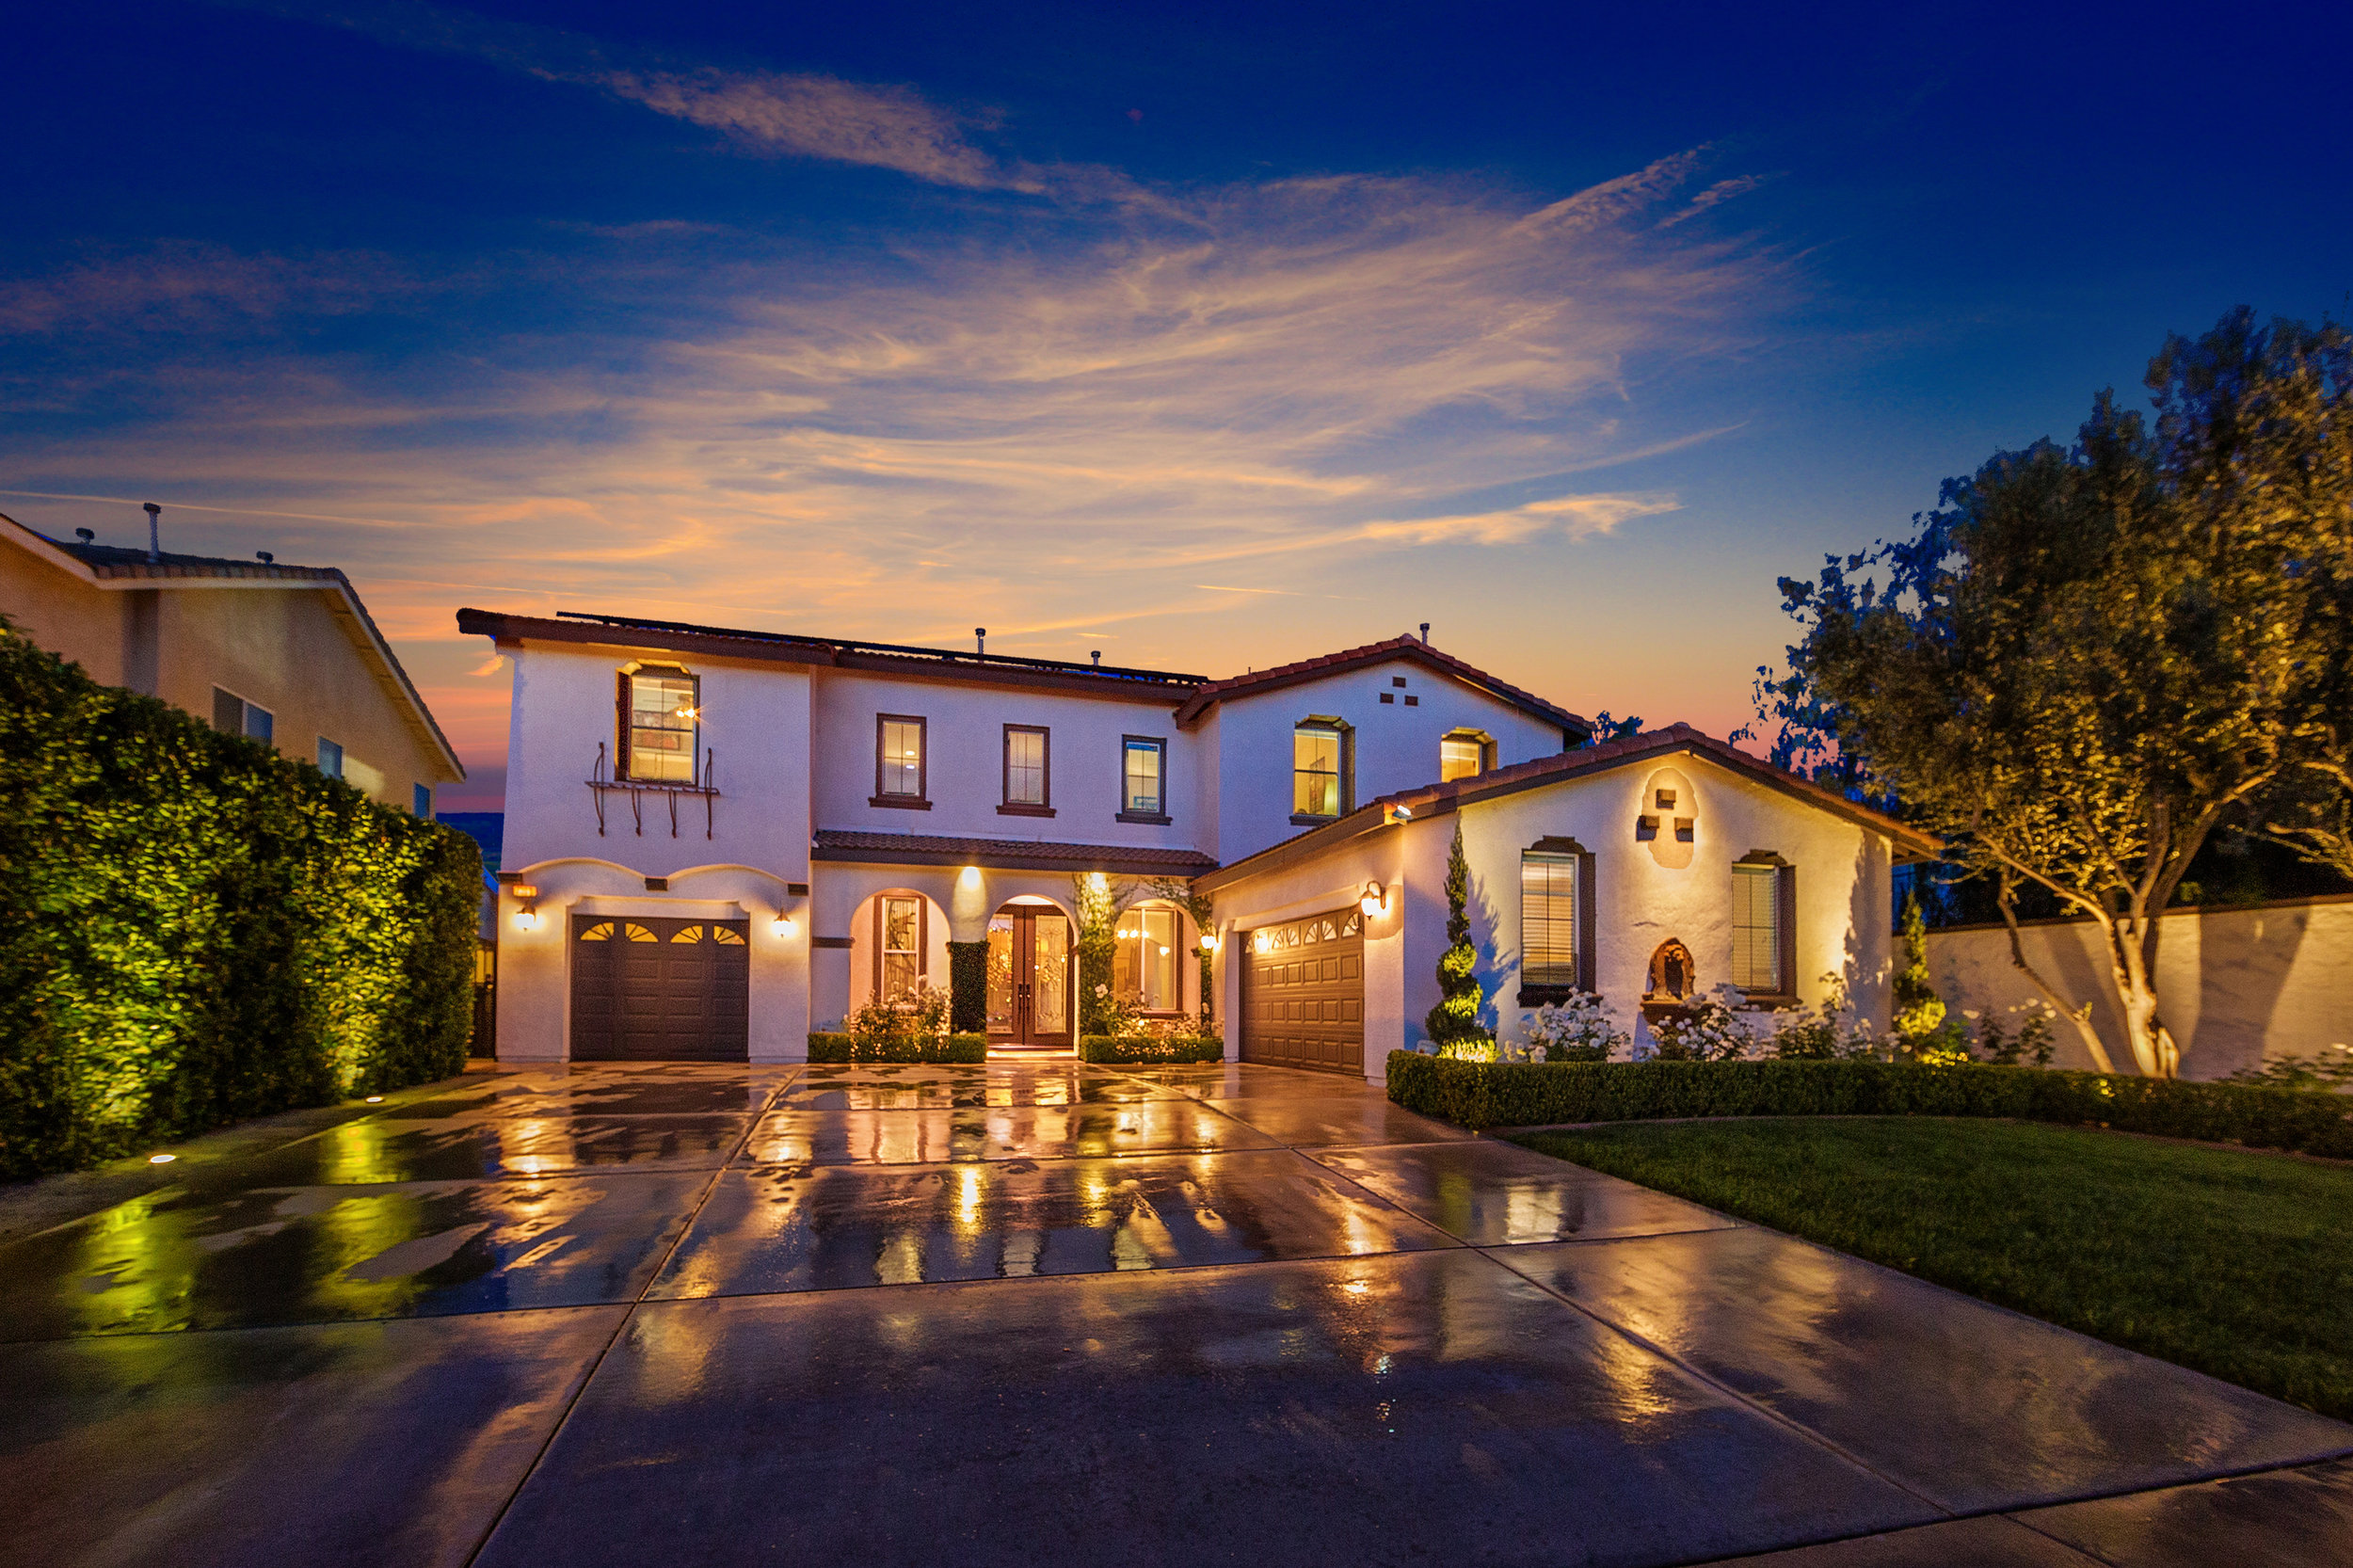 7230 Cottage grove dr. eastvale, CA 92880 5BR & 4.5 BA, Yr Built 2006 3,631 SQFT Living, 9,583 sqft lot